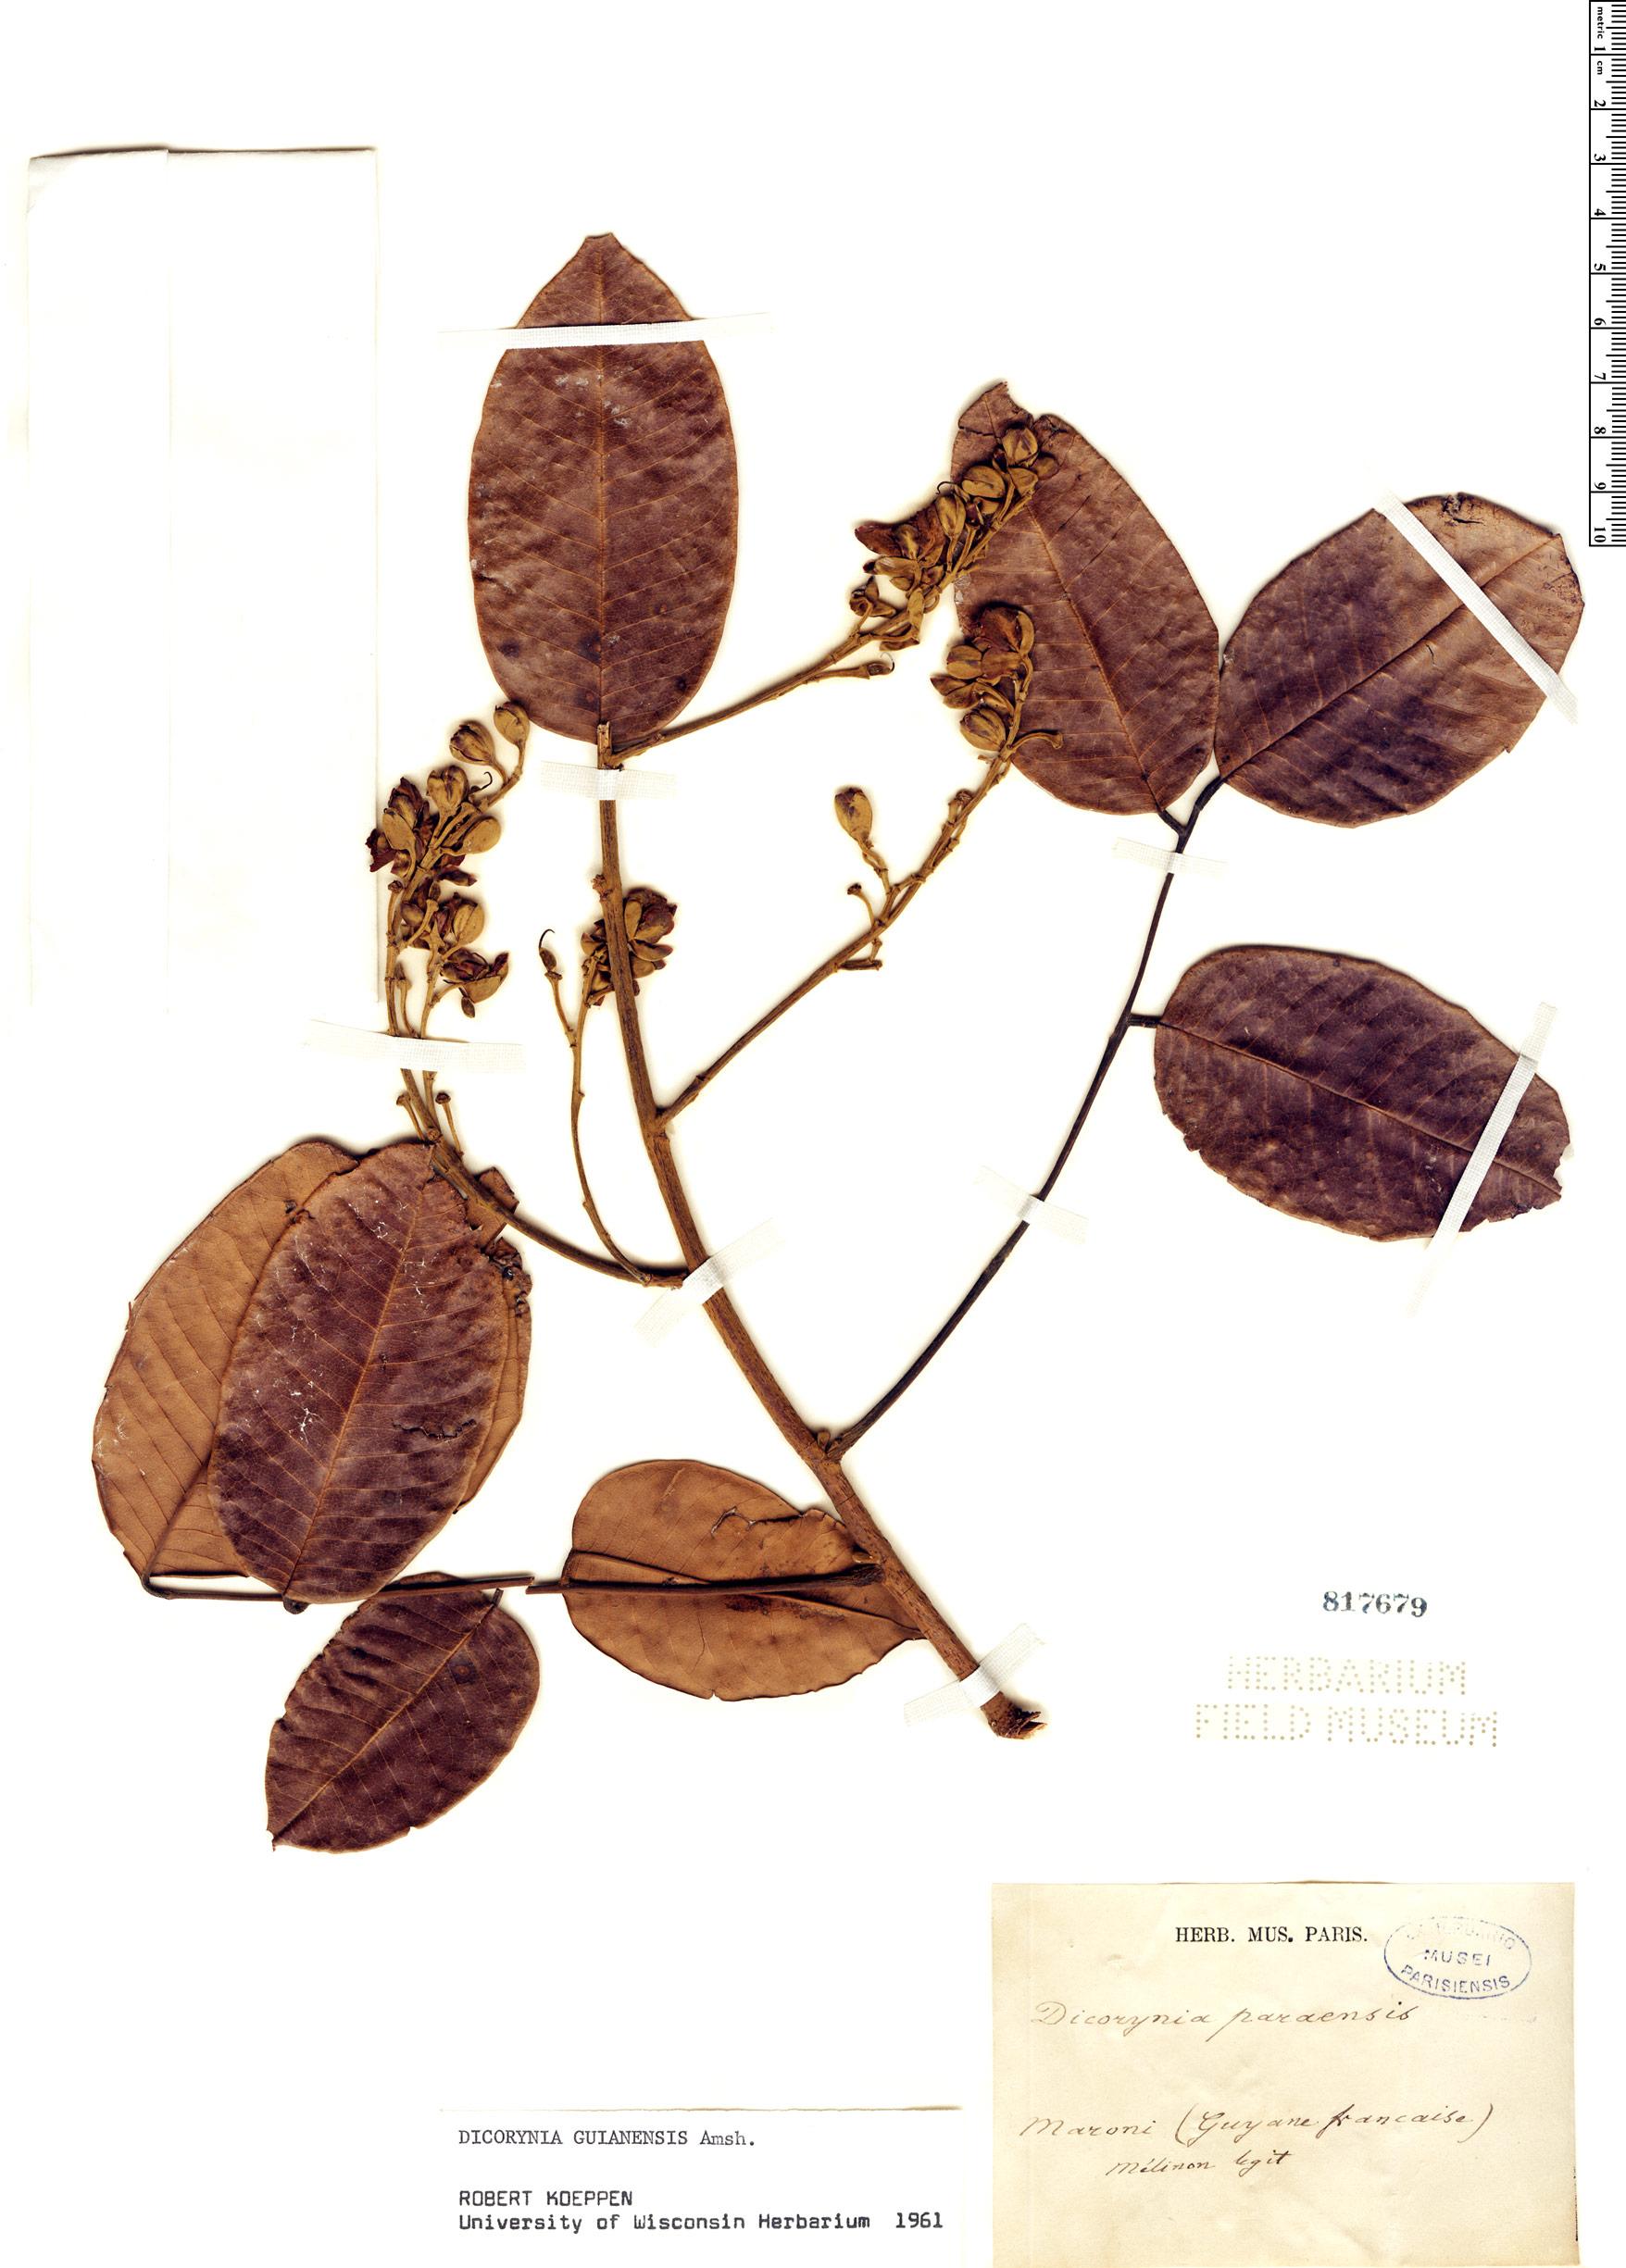 Specimen: Dicorynia guianensis